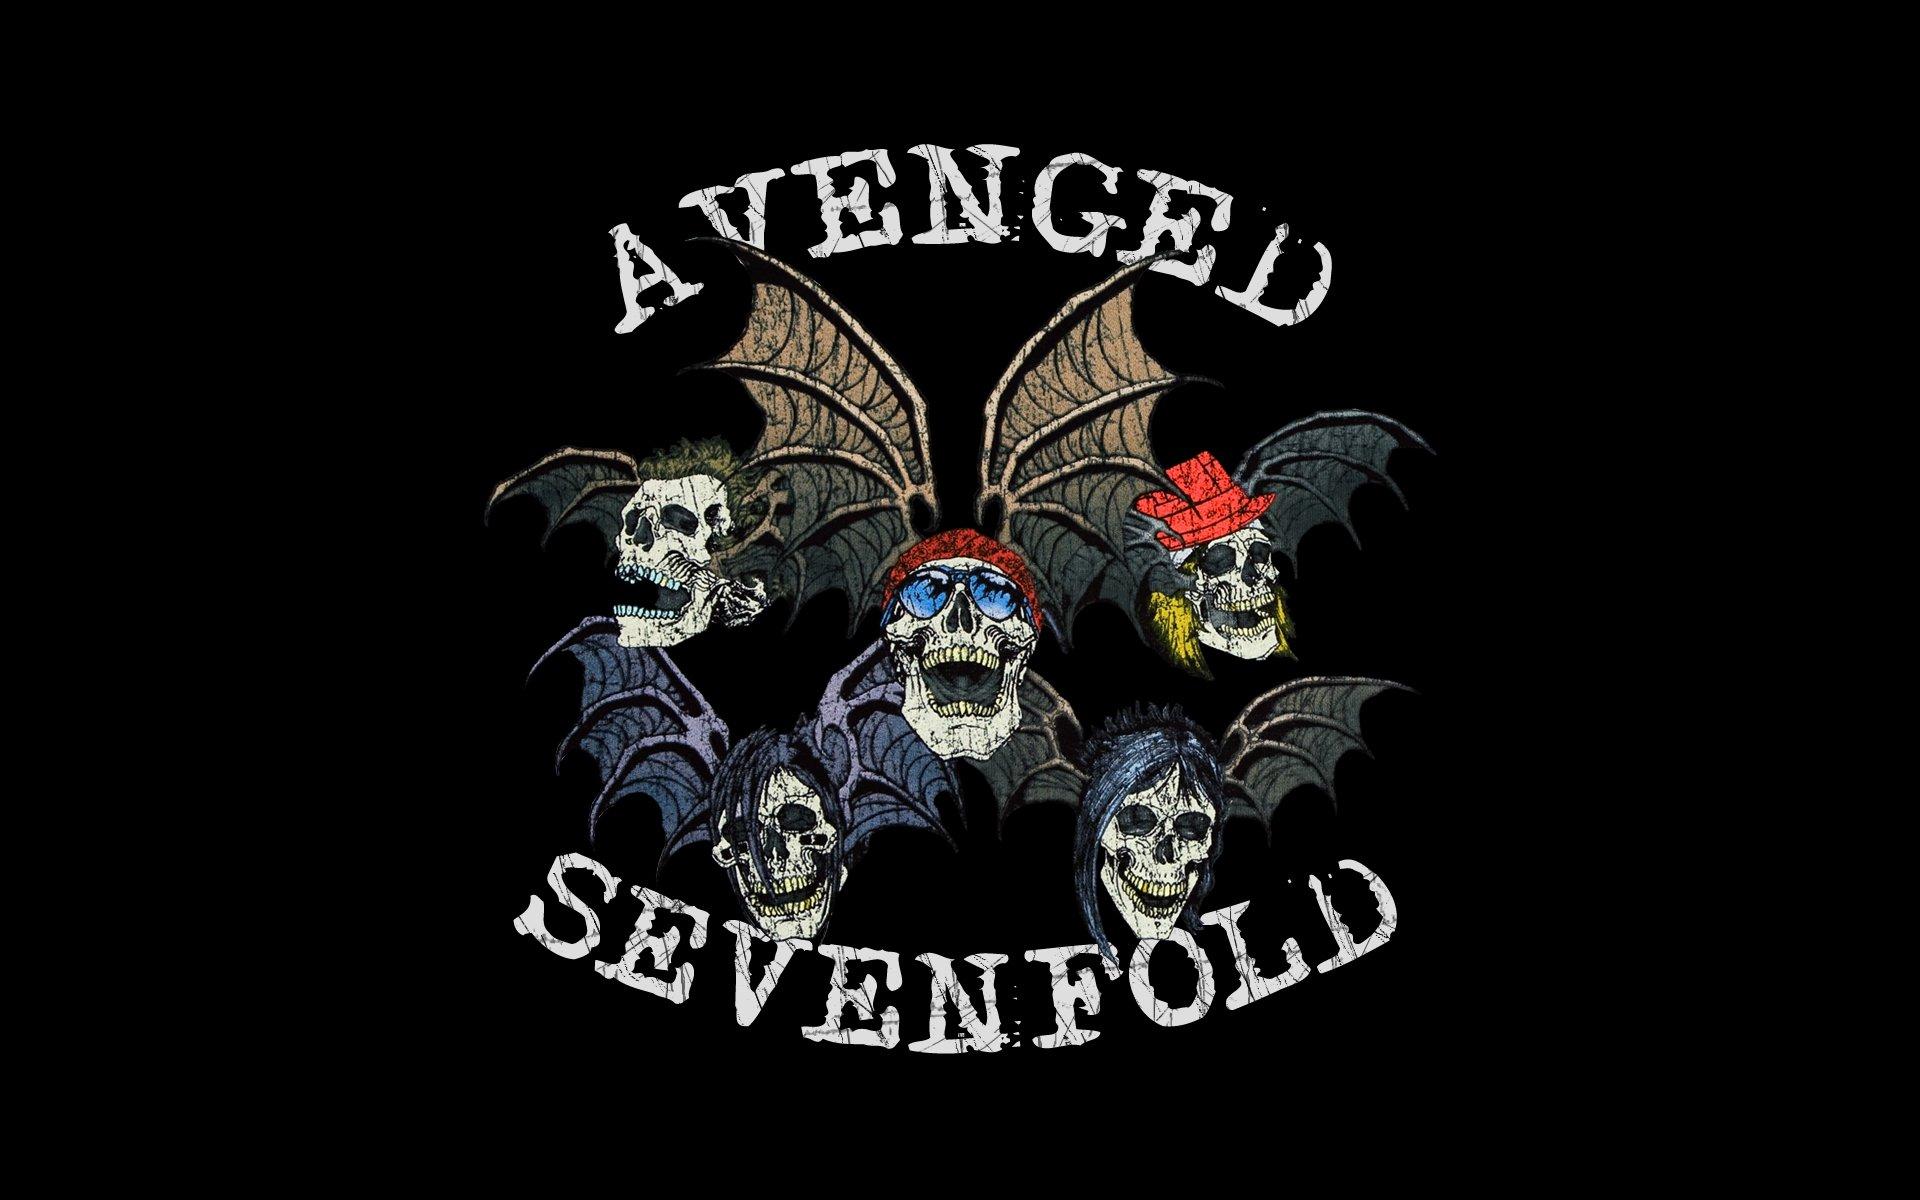 25 avenged sevenfold hd